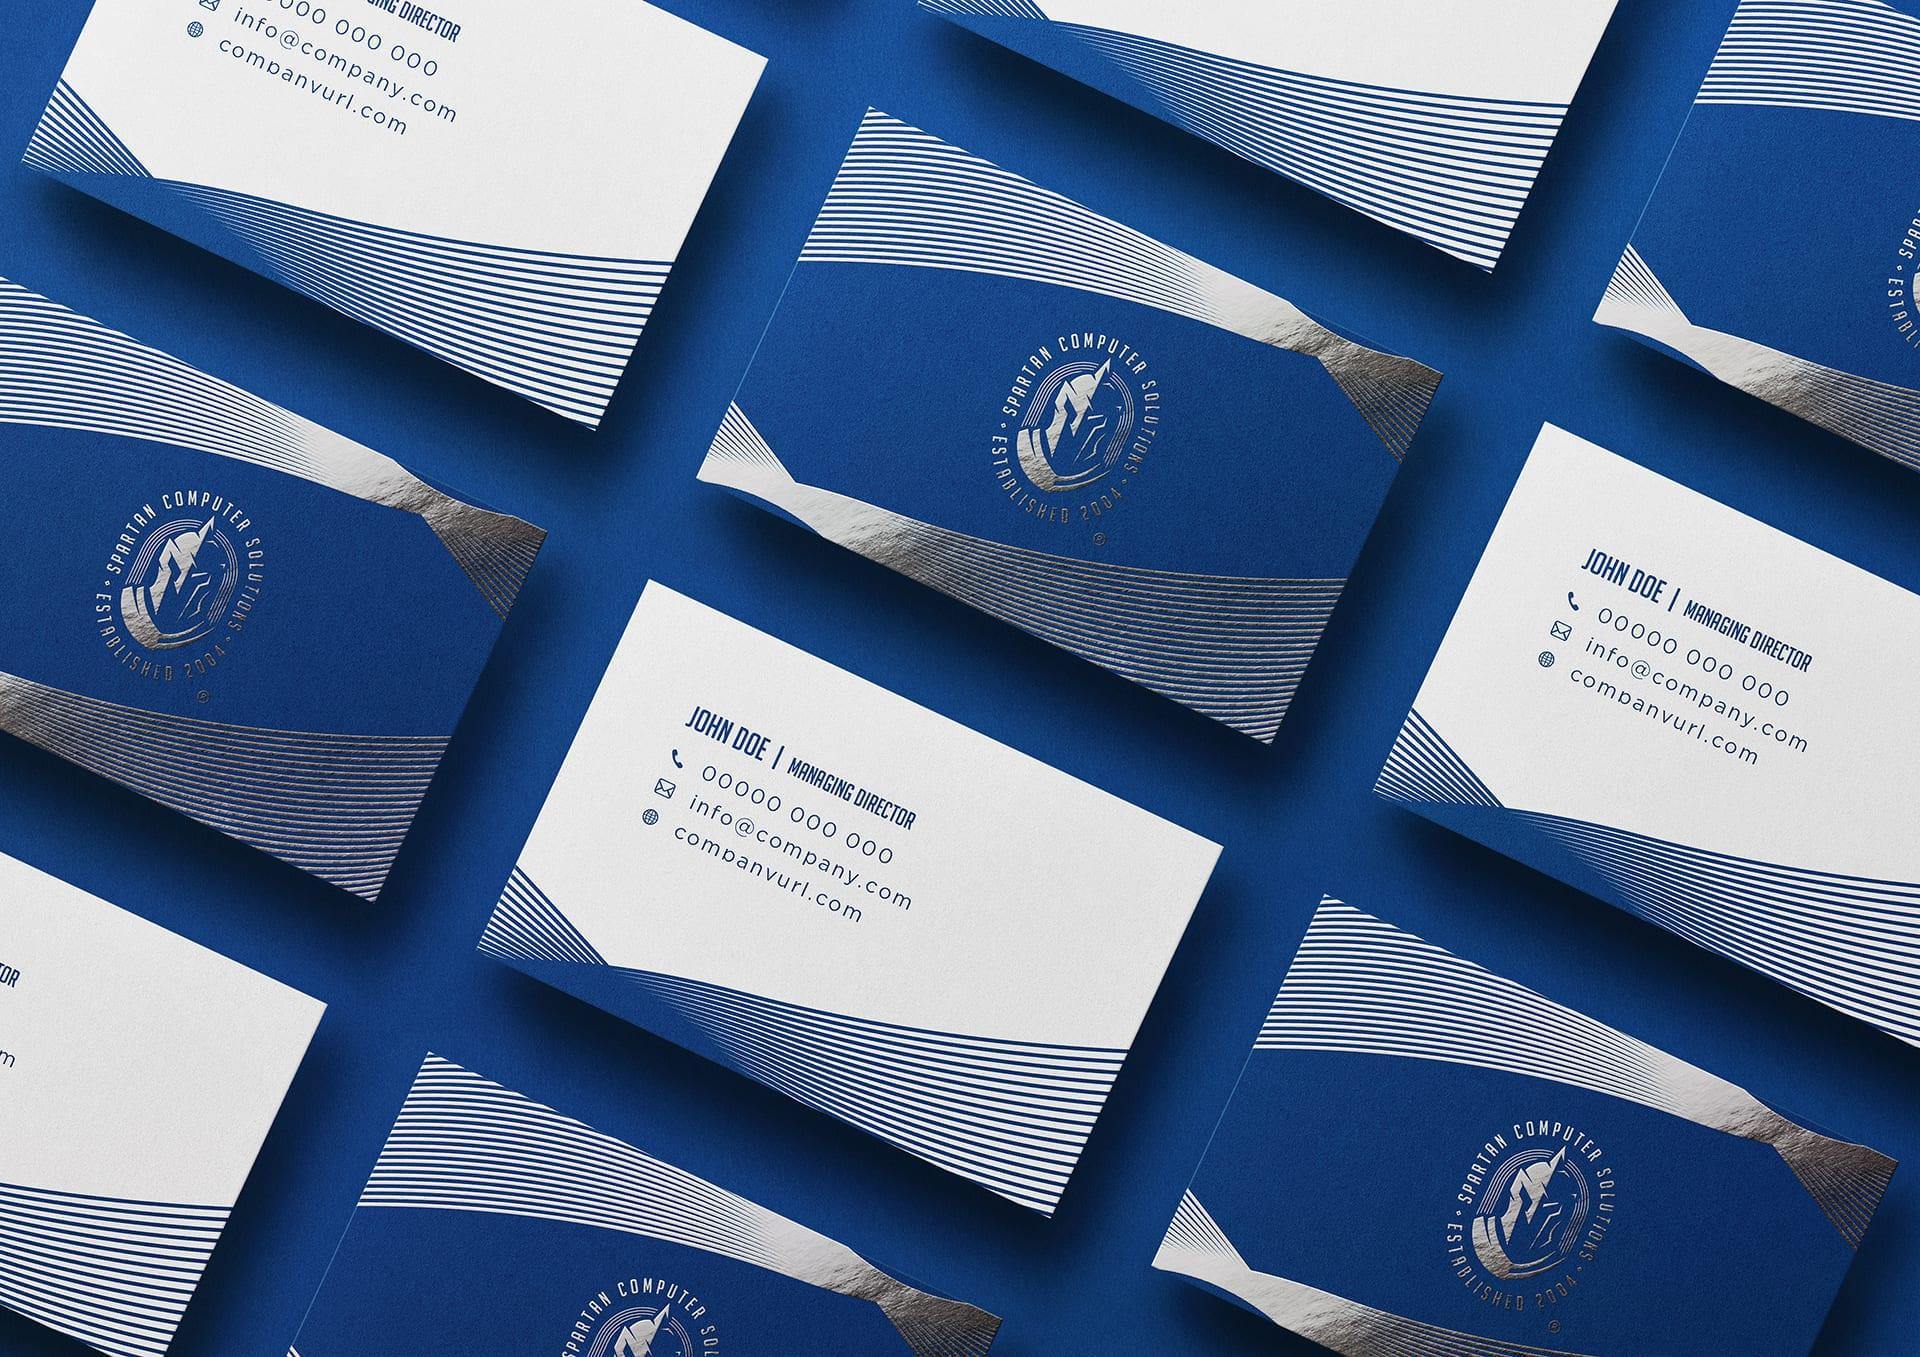 Spartan Computer Solutions Shiny Matte Business Card Mockup Design